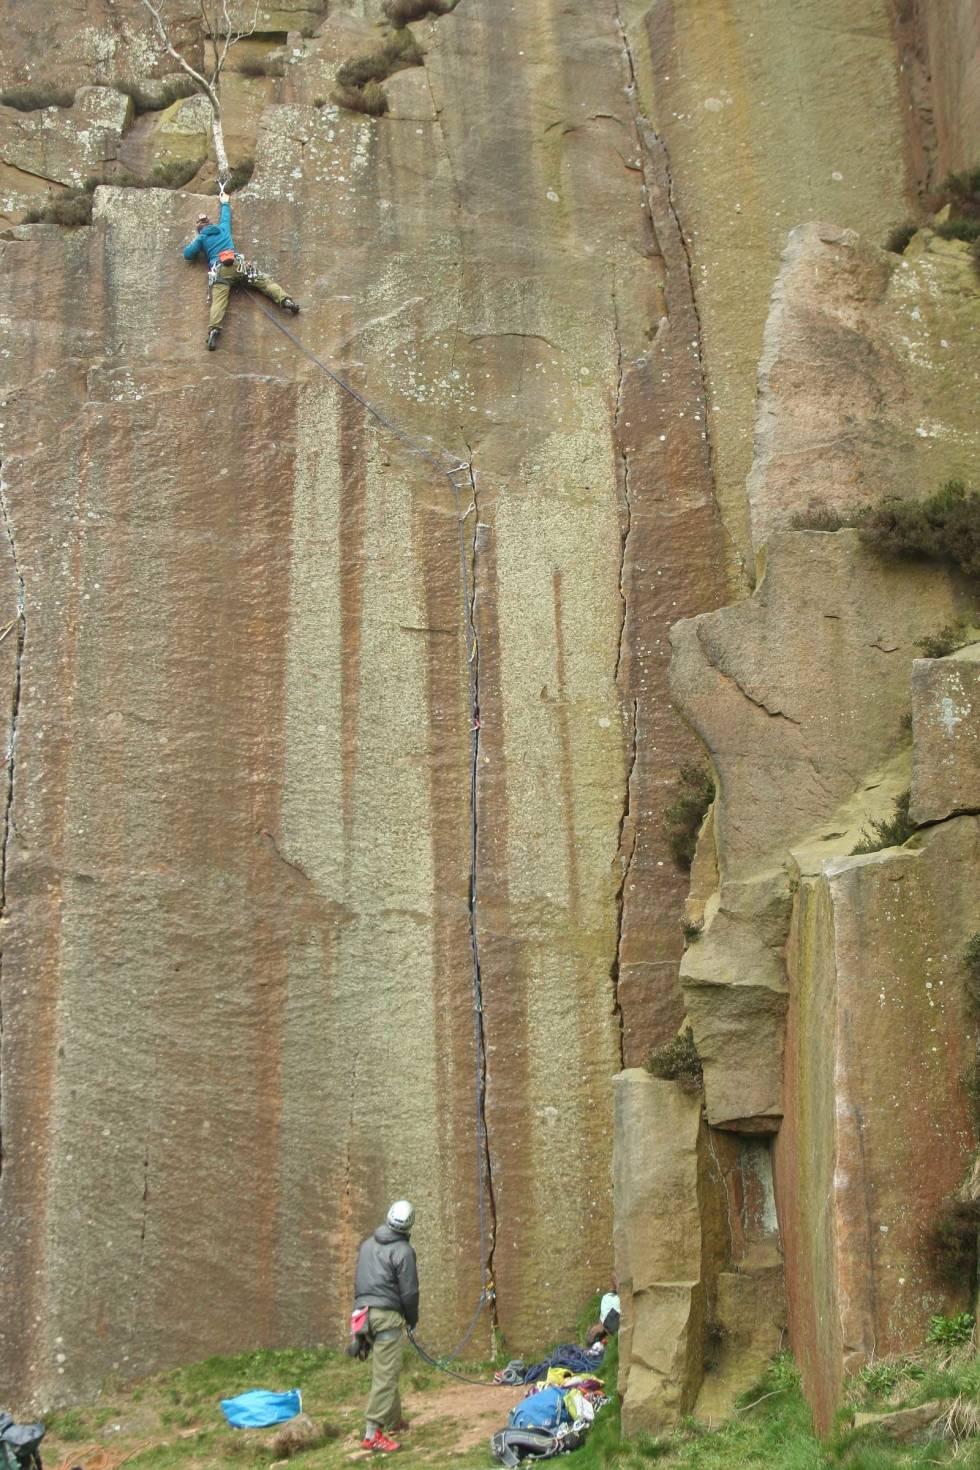 Peak-District-England-Paula-Voldner-7